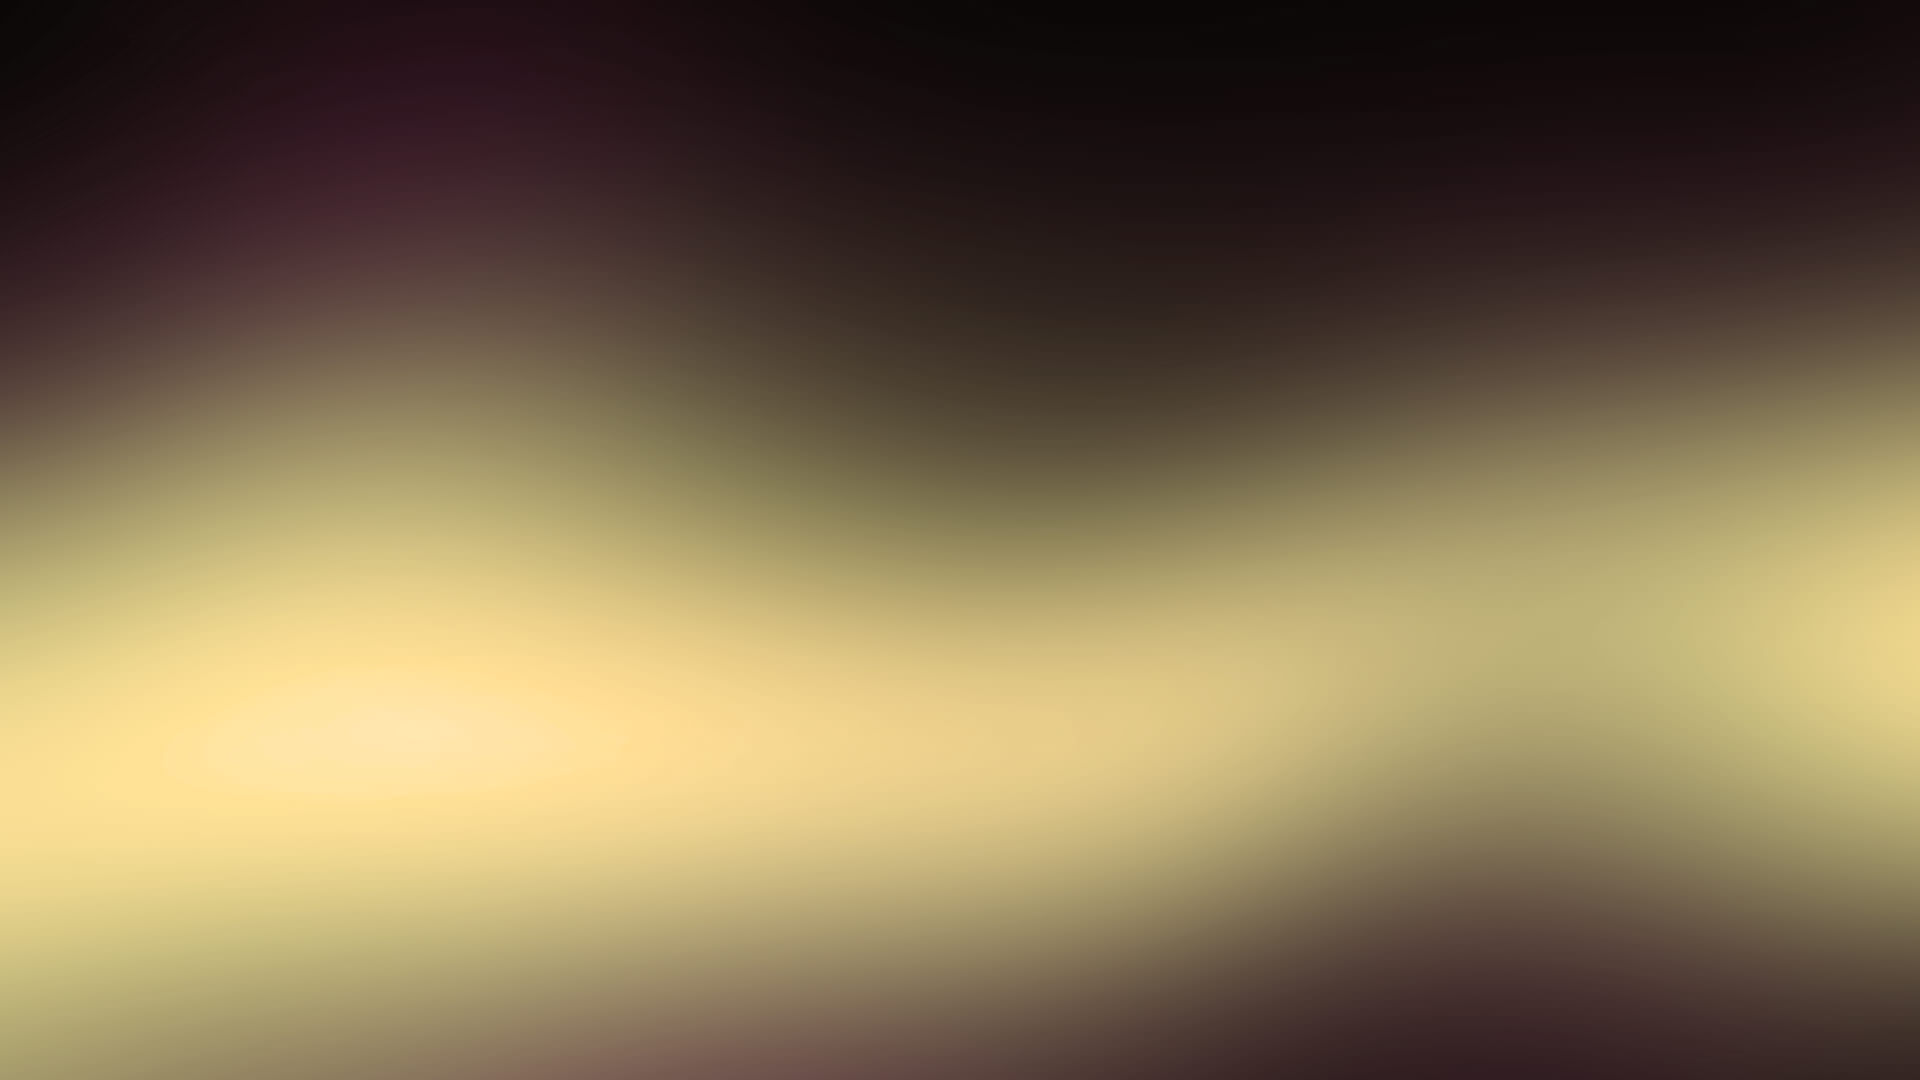 Extraordinary Gradient HD Wallpaper